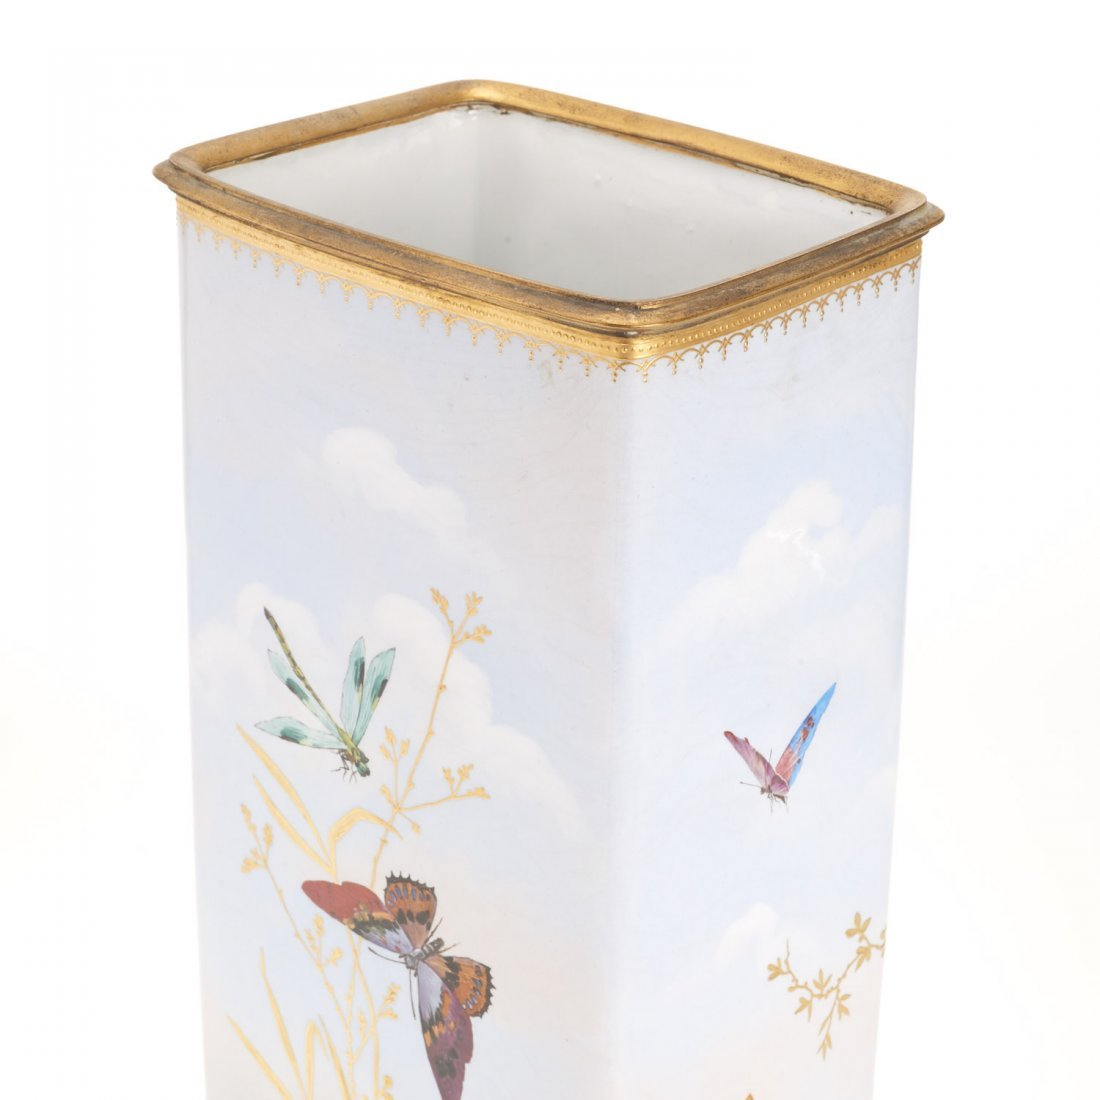 Gilt bronze mounted porcelain vase signed Baston - 2